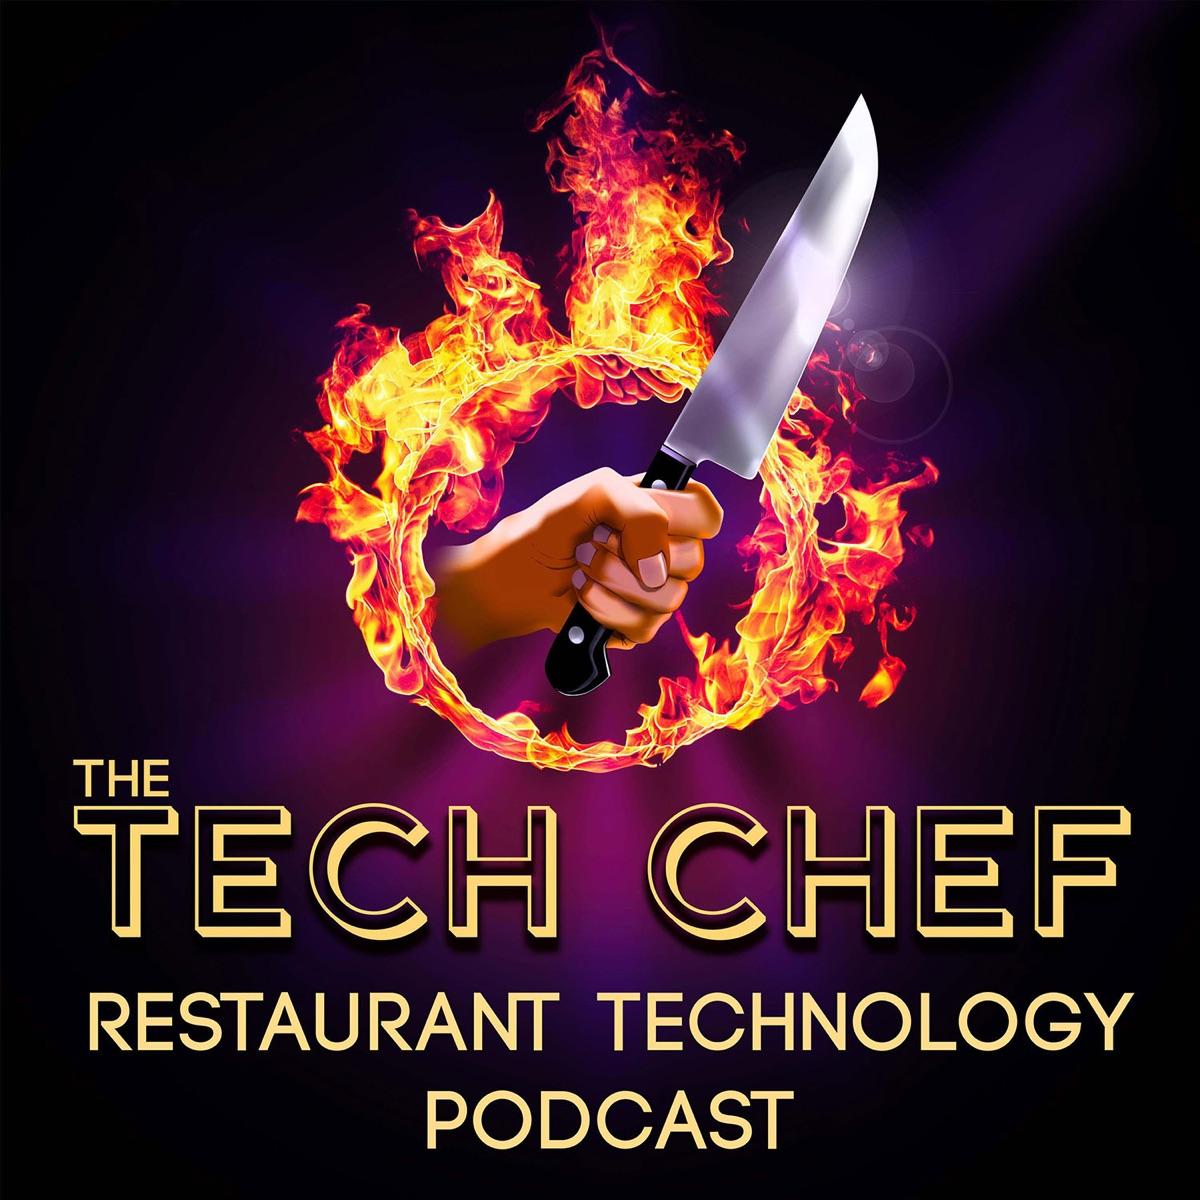 The Tech Chef